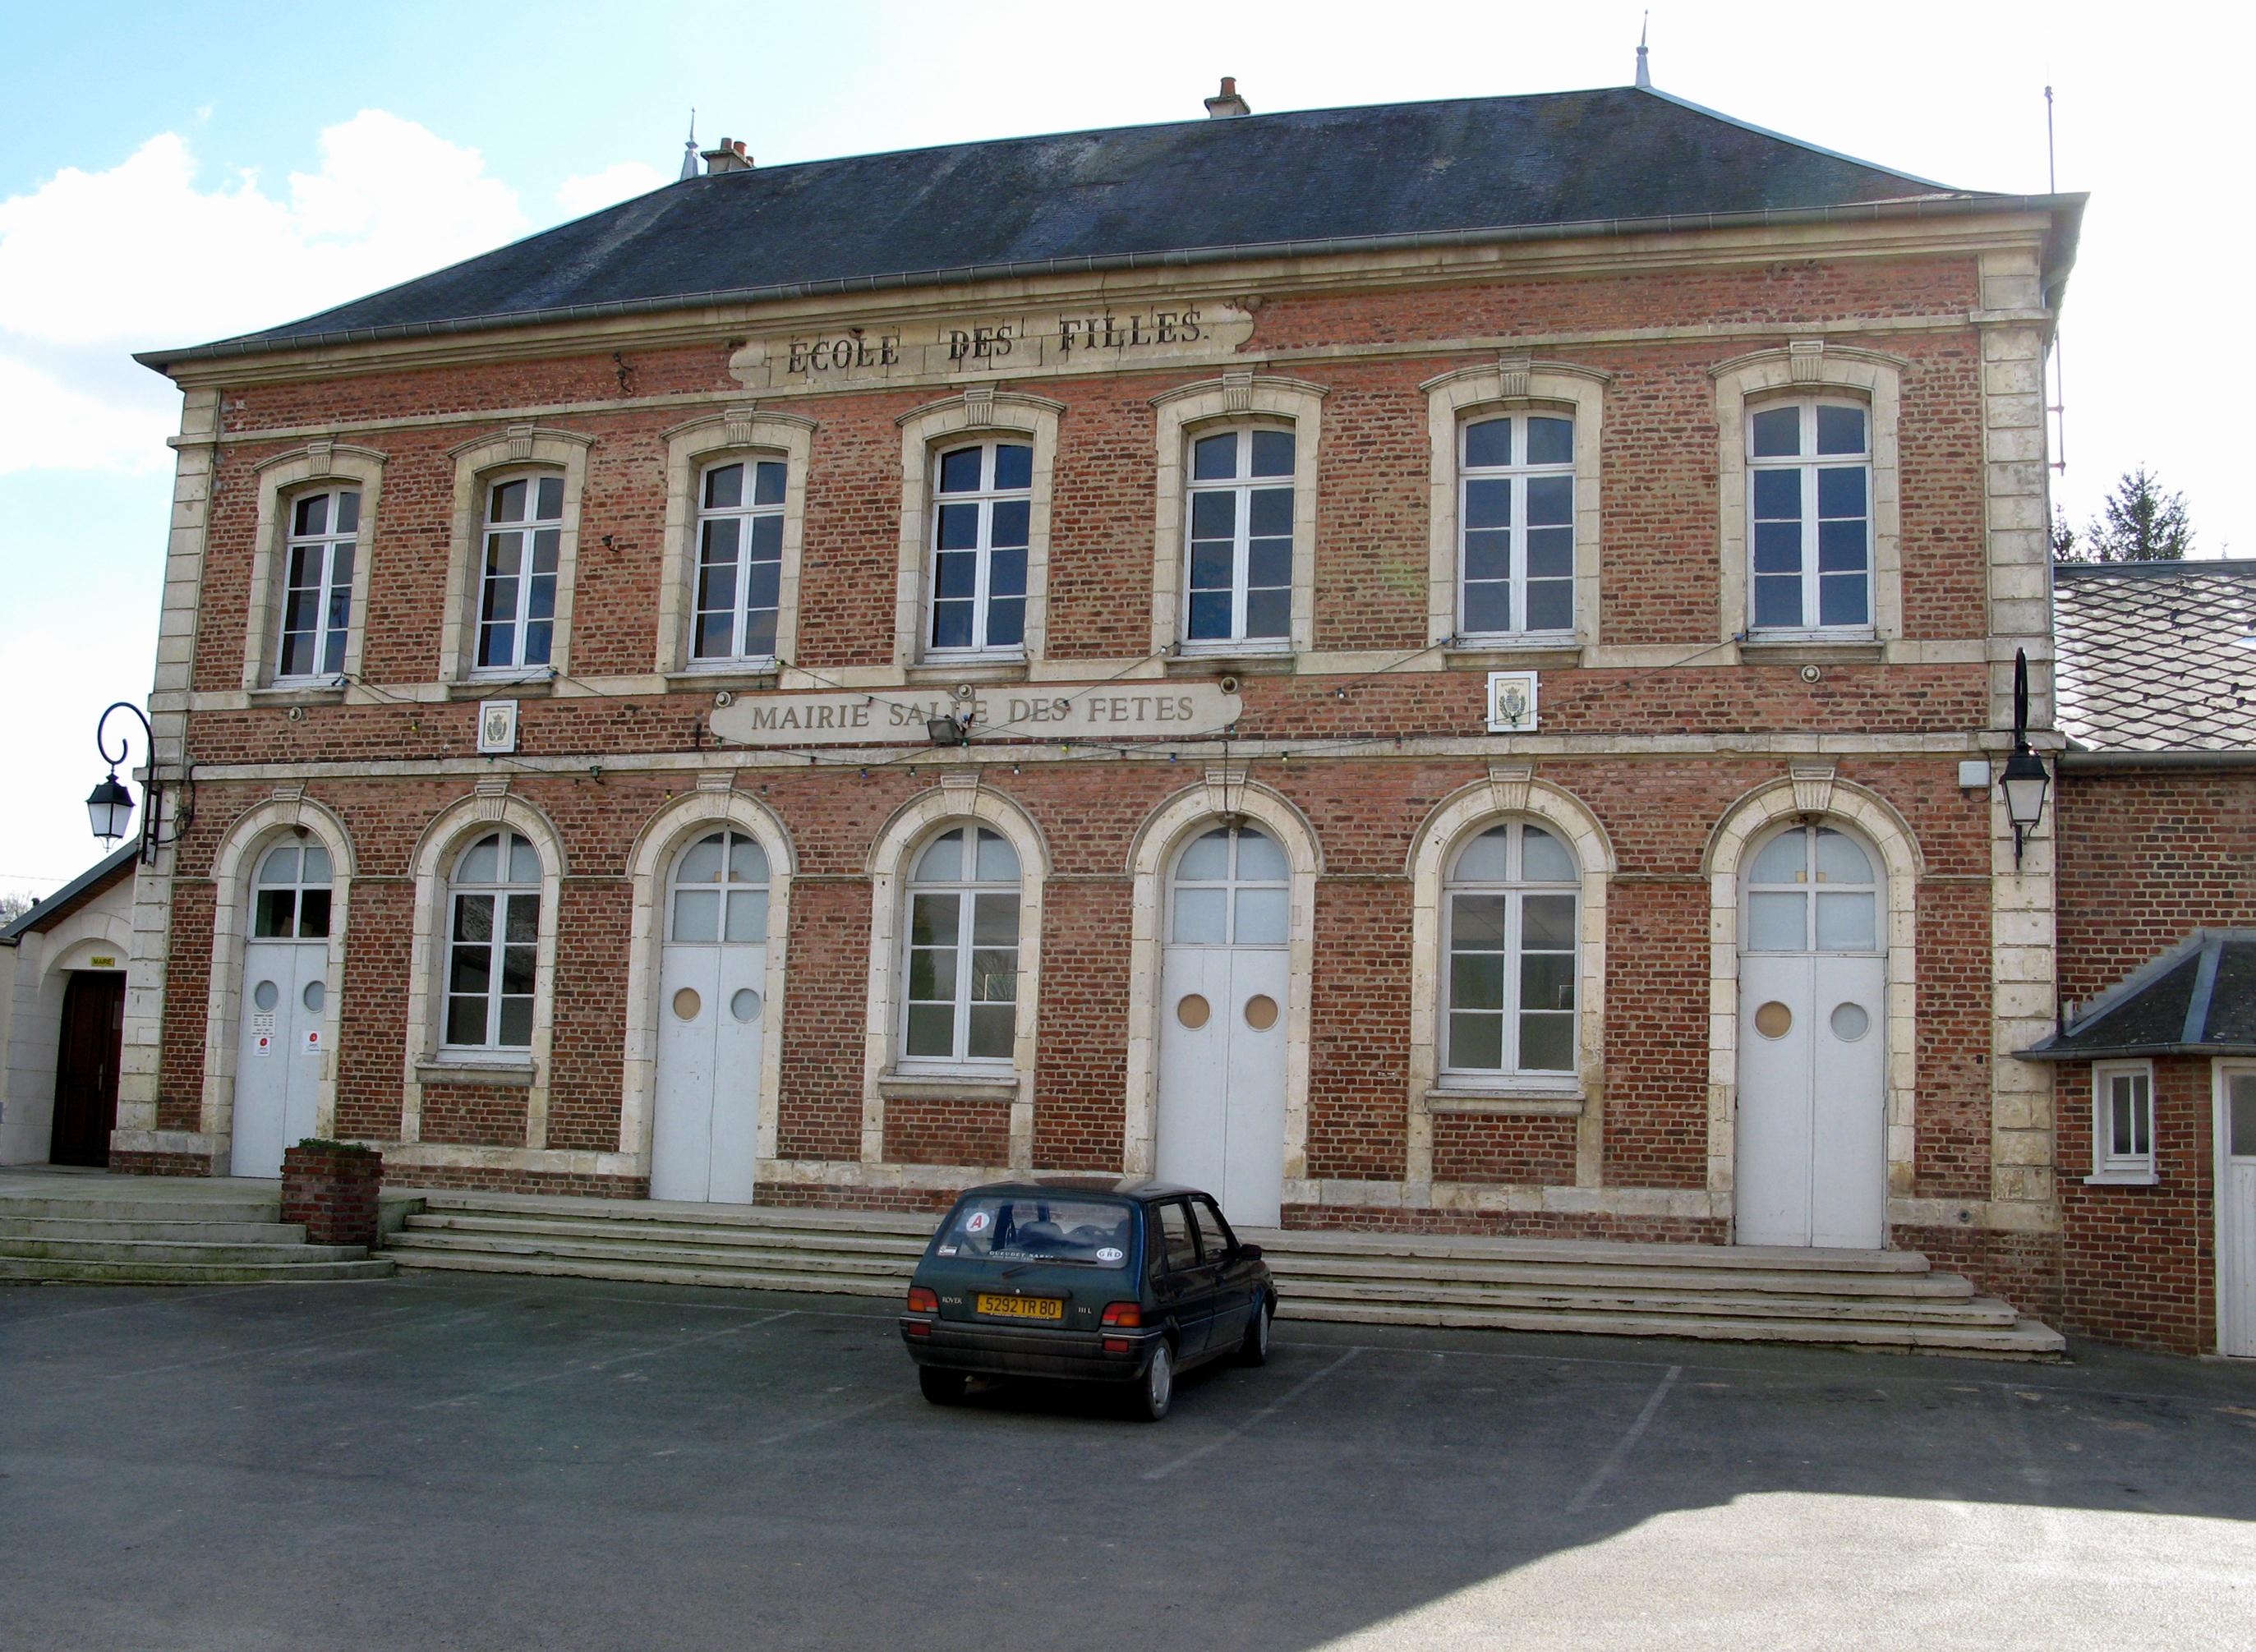 http://upload.wikimedia.org/wikipedia/commons/8/8a/Toutencourt_mairie_1.jpg